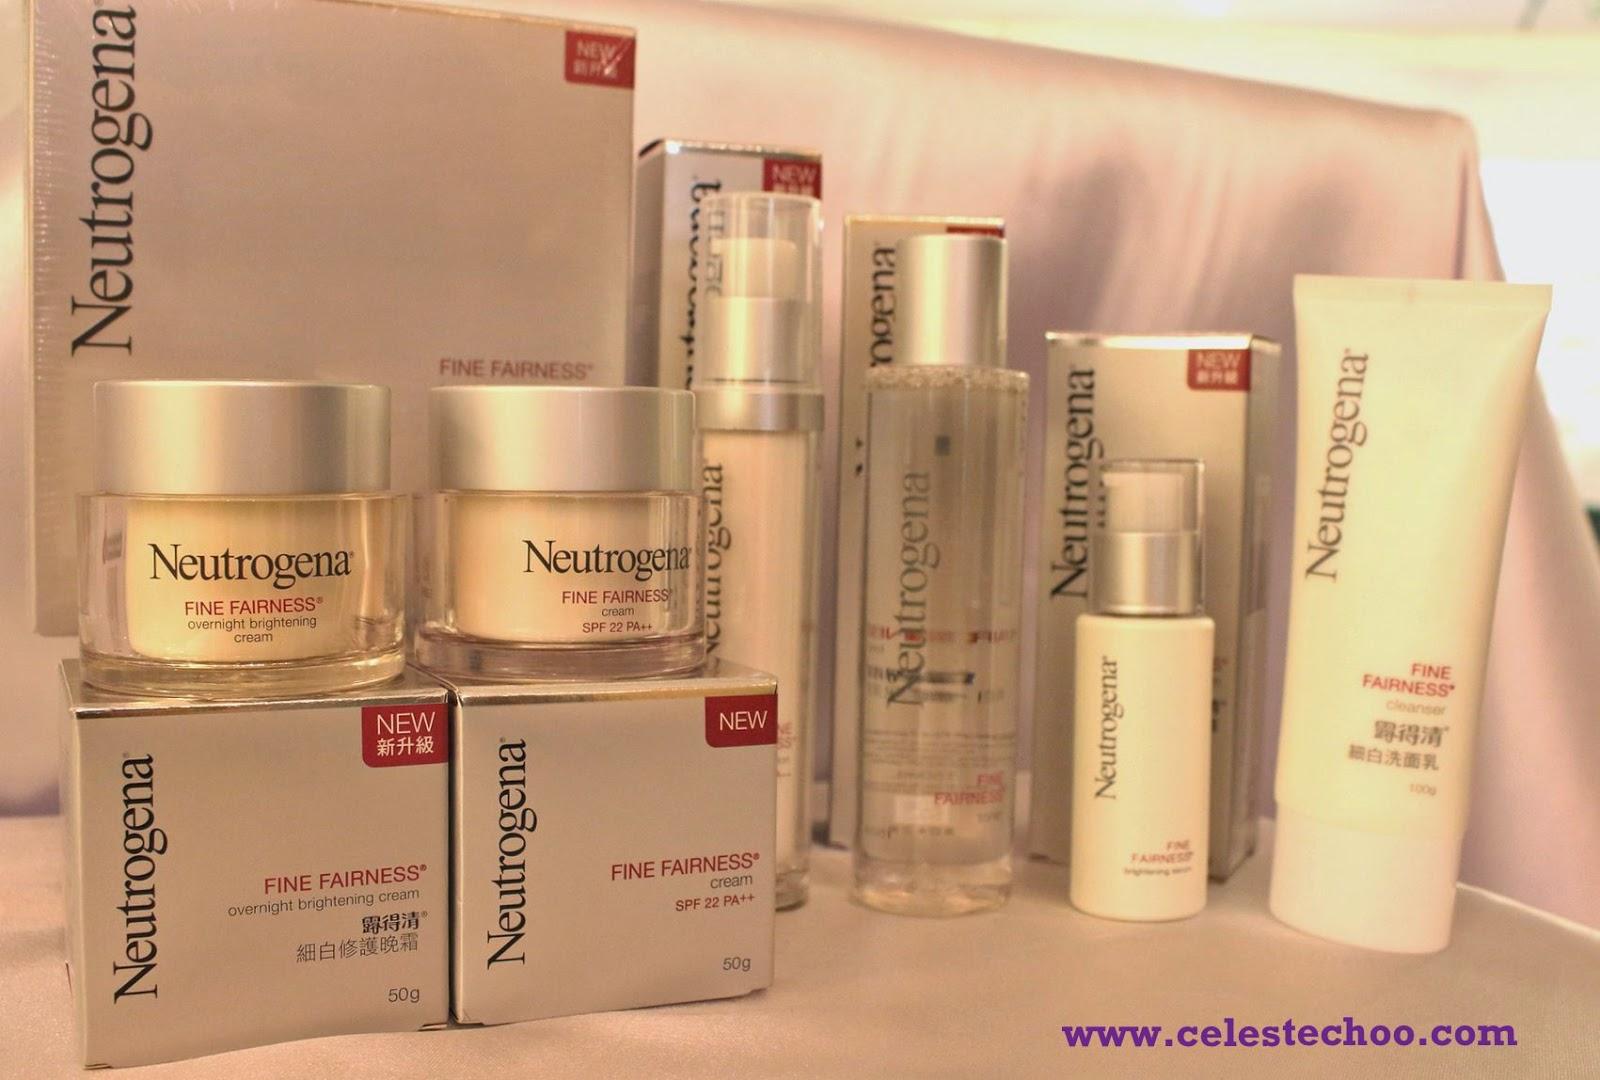 neutrogena_60th_anniversary_fine_fairness_brightening_skincare